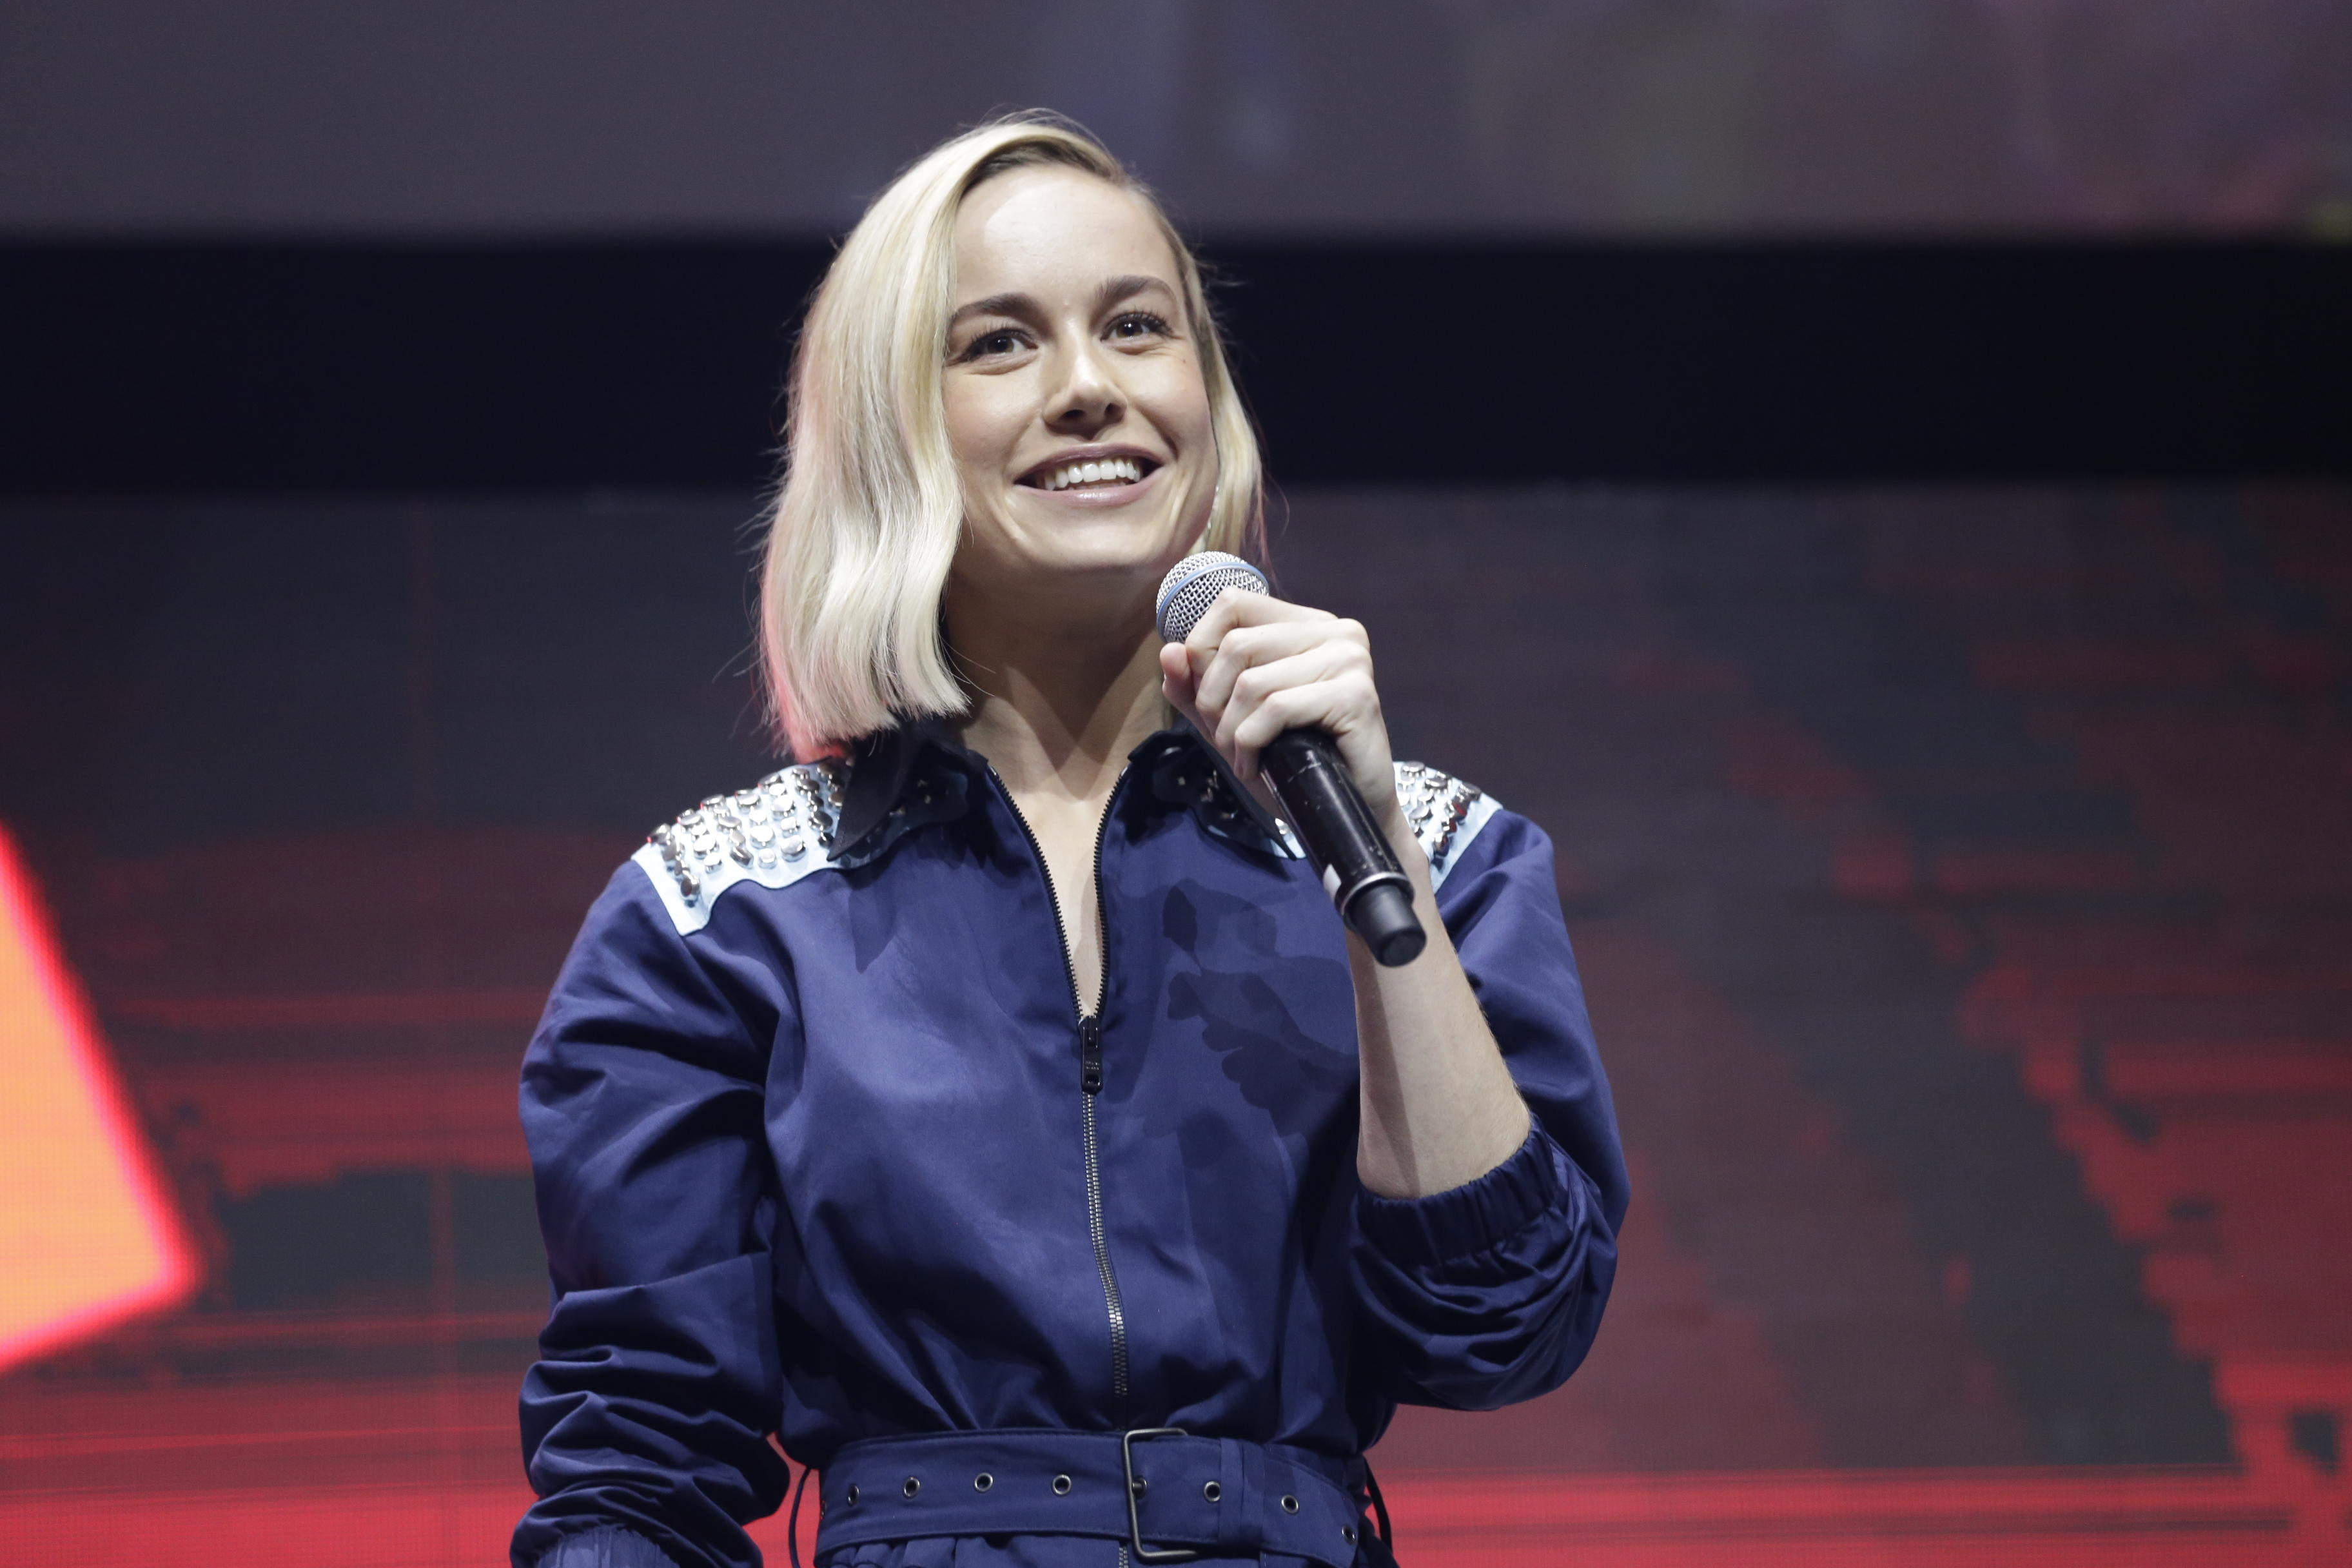 Brie Larson at CCXP18 in São Paulo